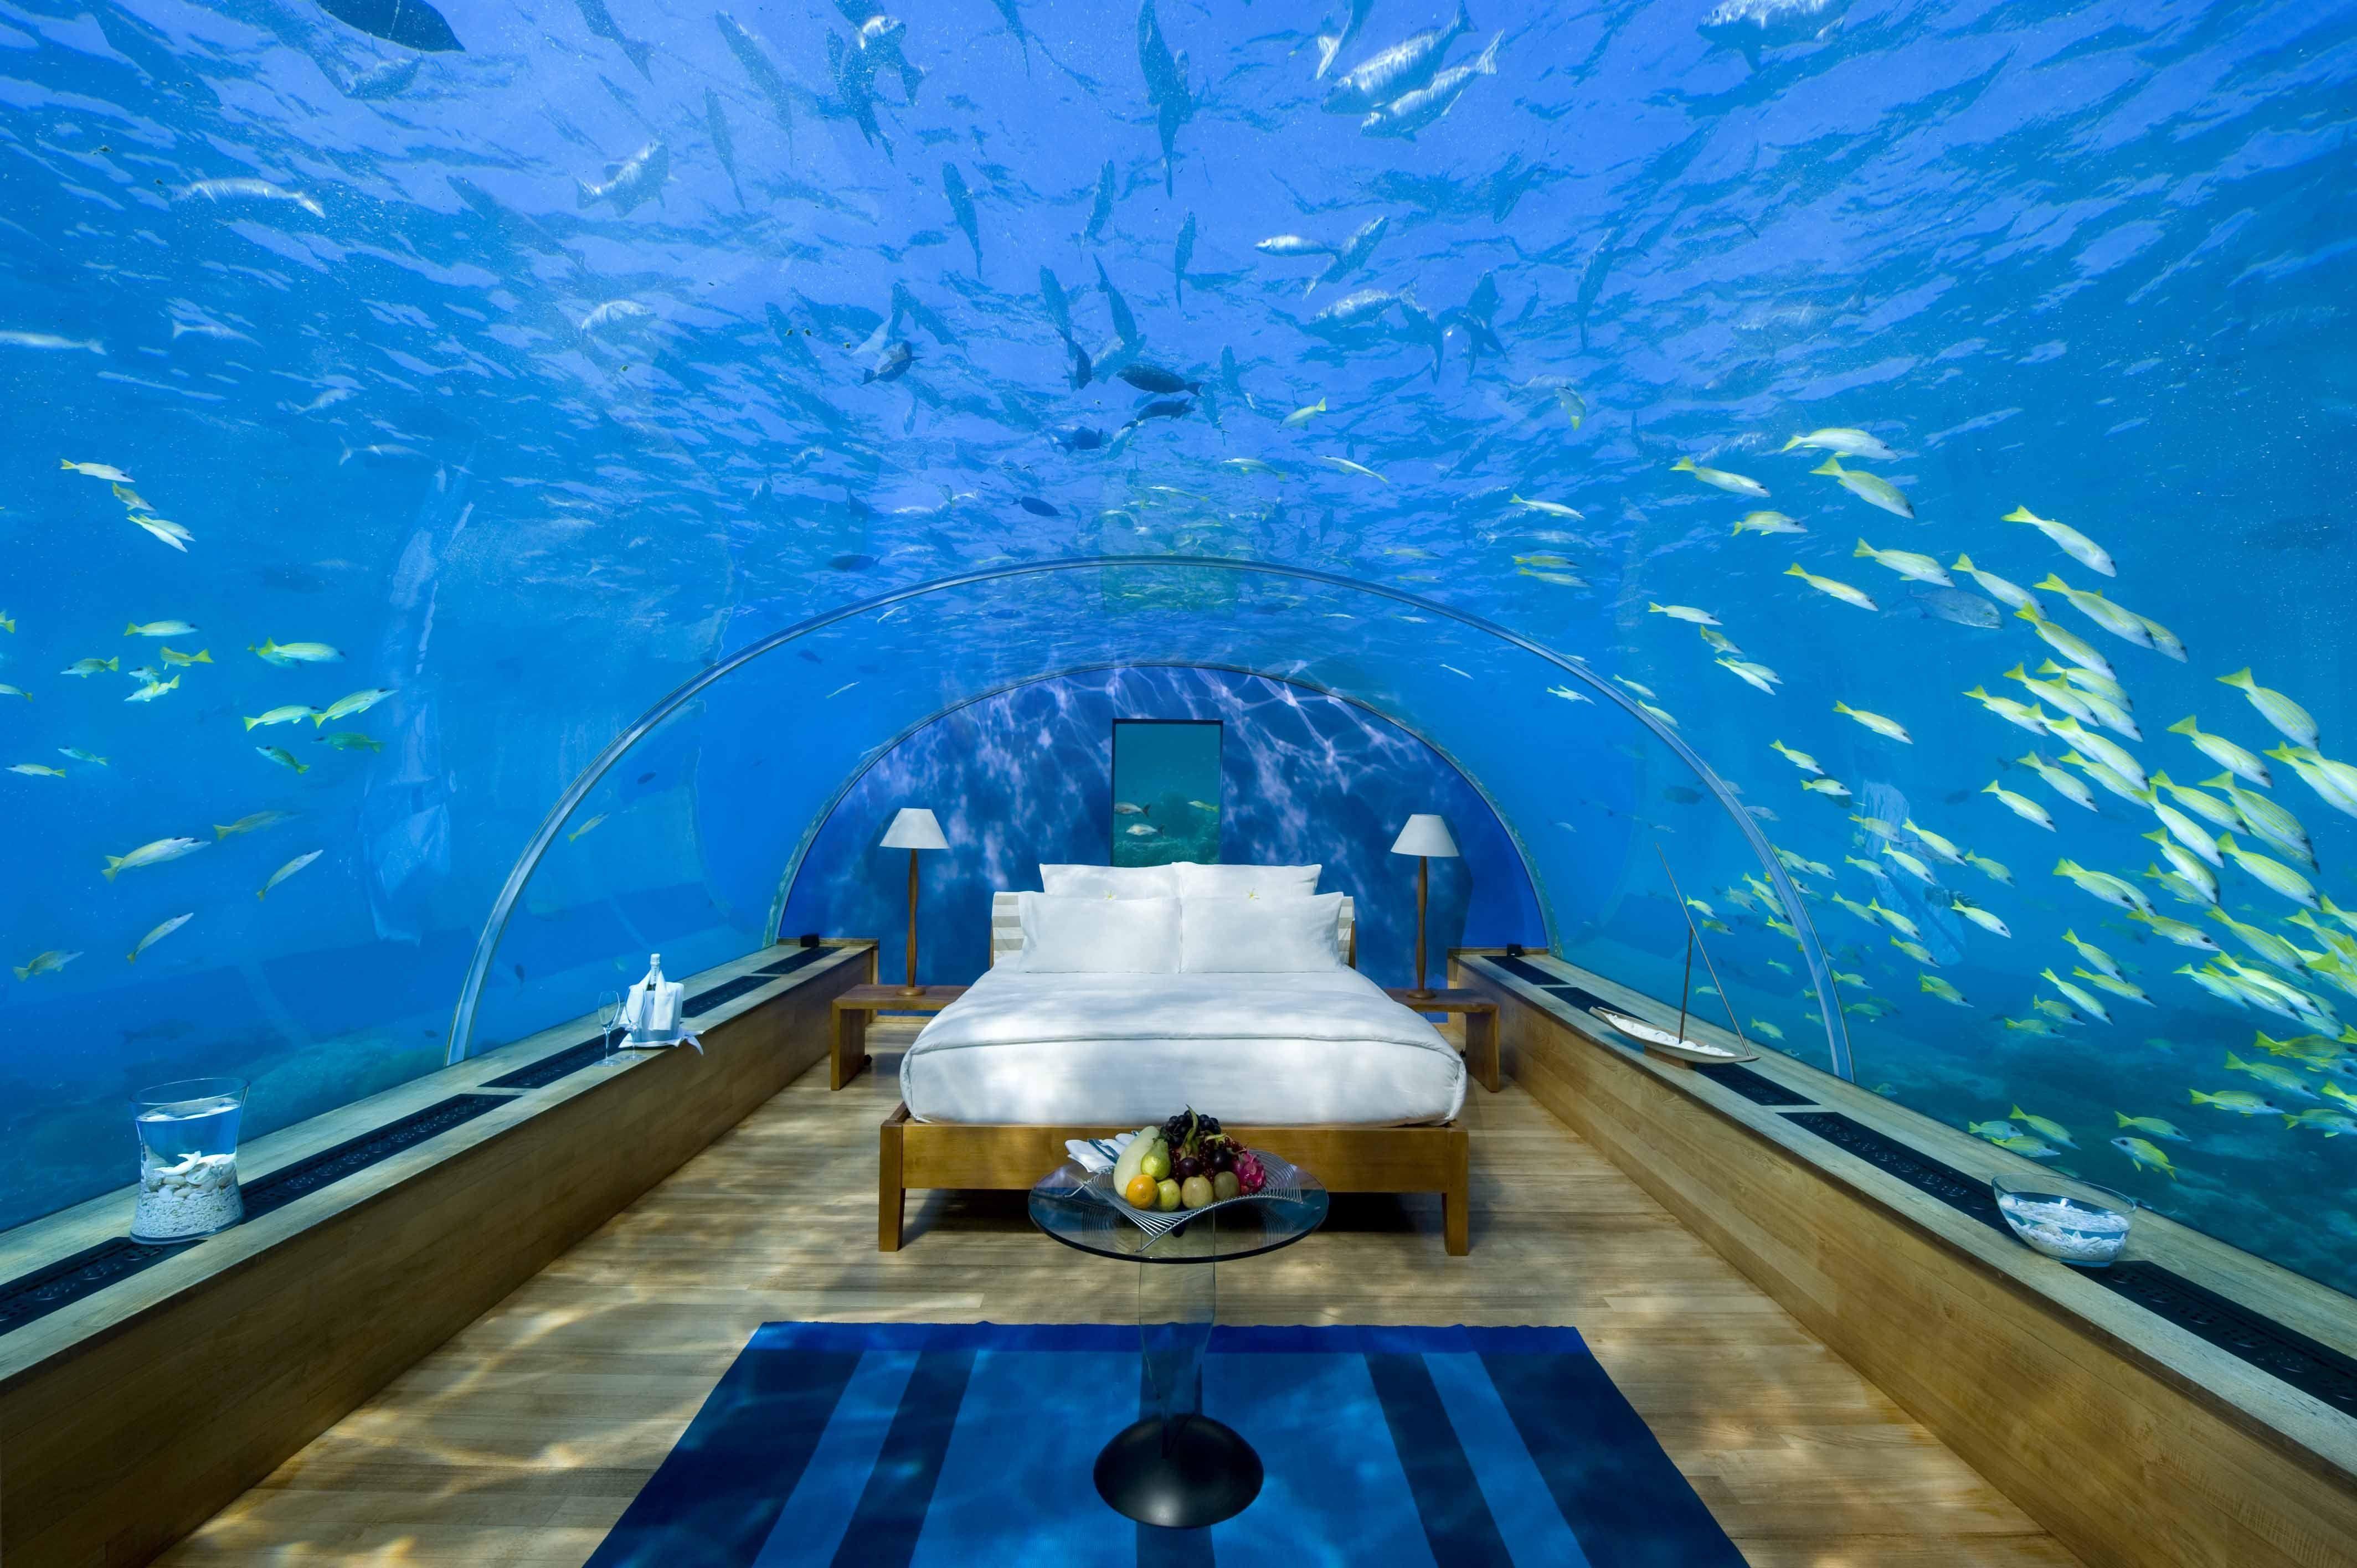 Superbe Underwater Hotel Room At The Manta Resort Offers Privacy And Serenity.  Location: Pemba Island, Zanzibar